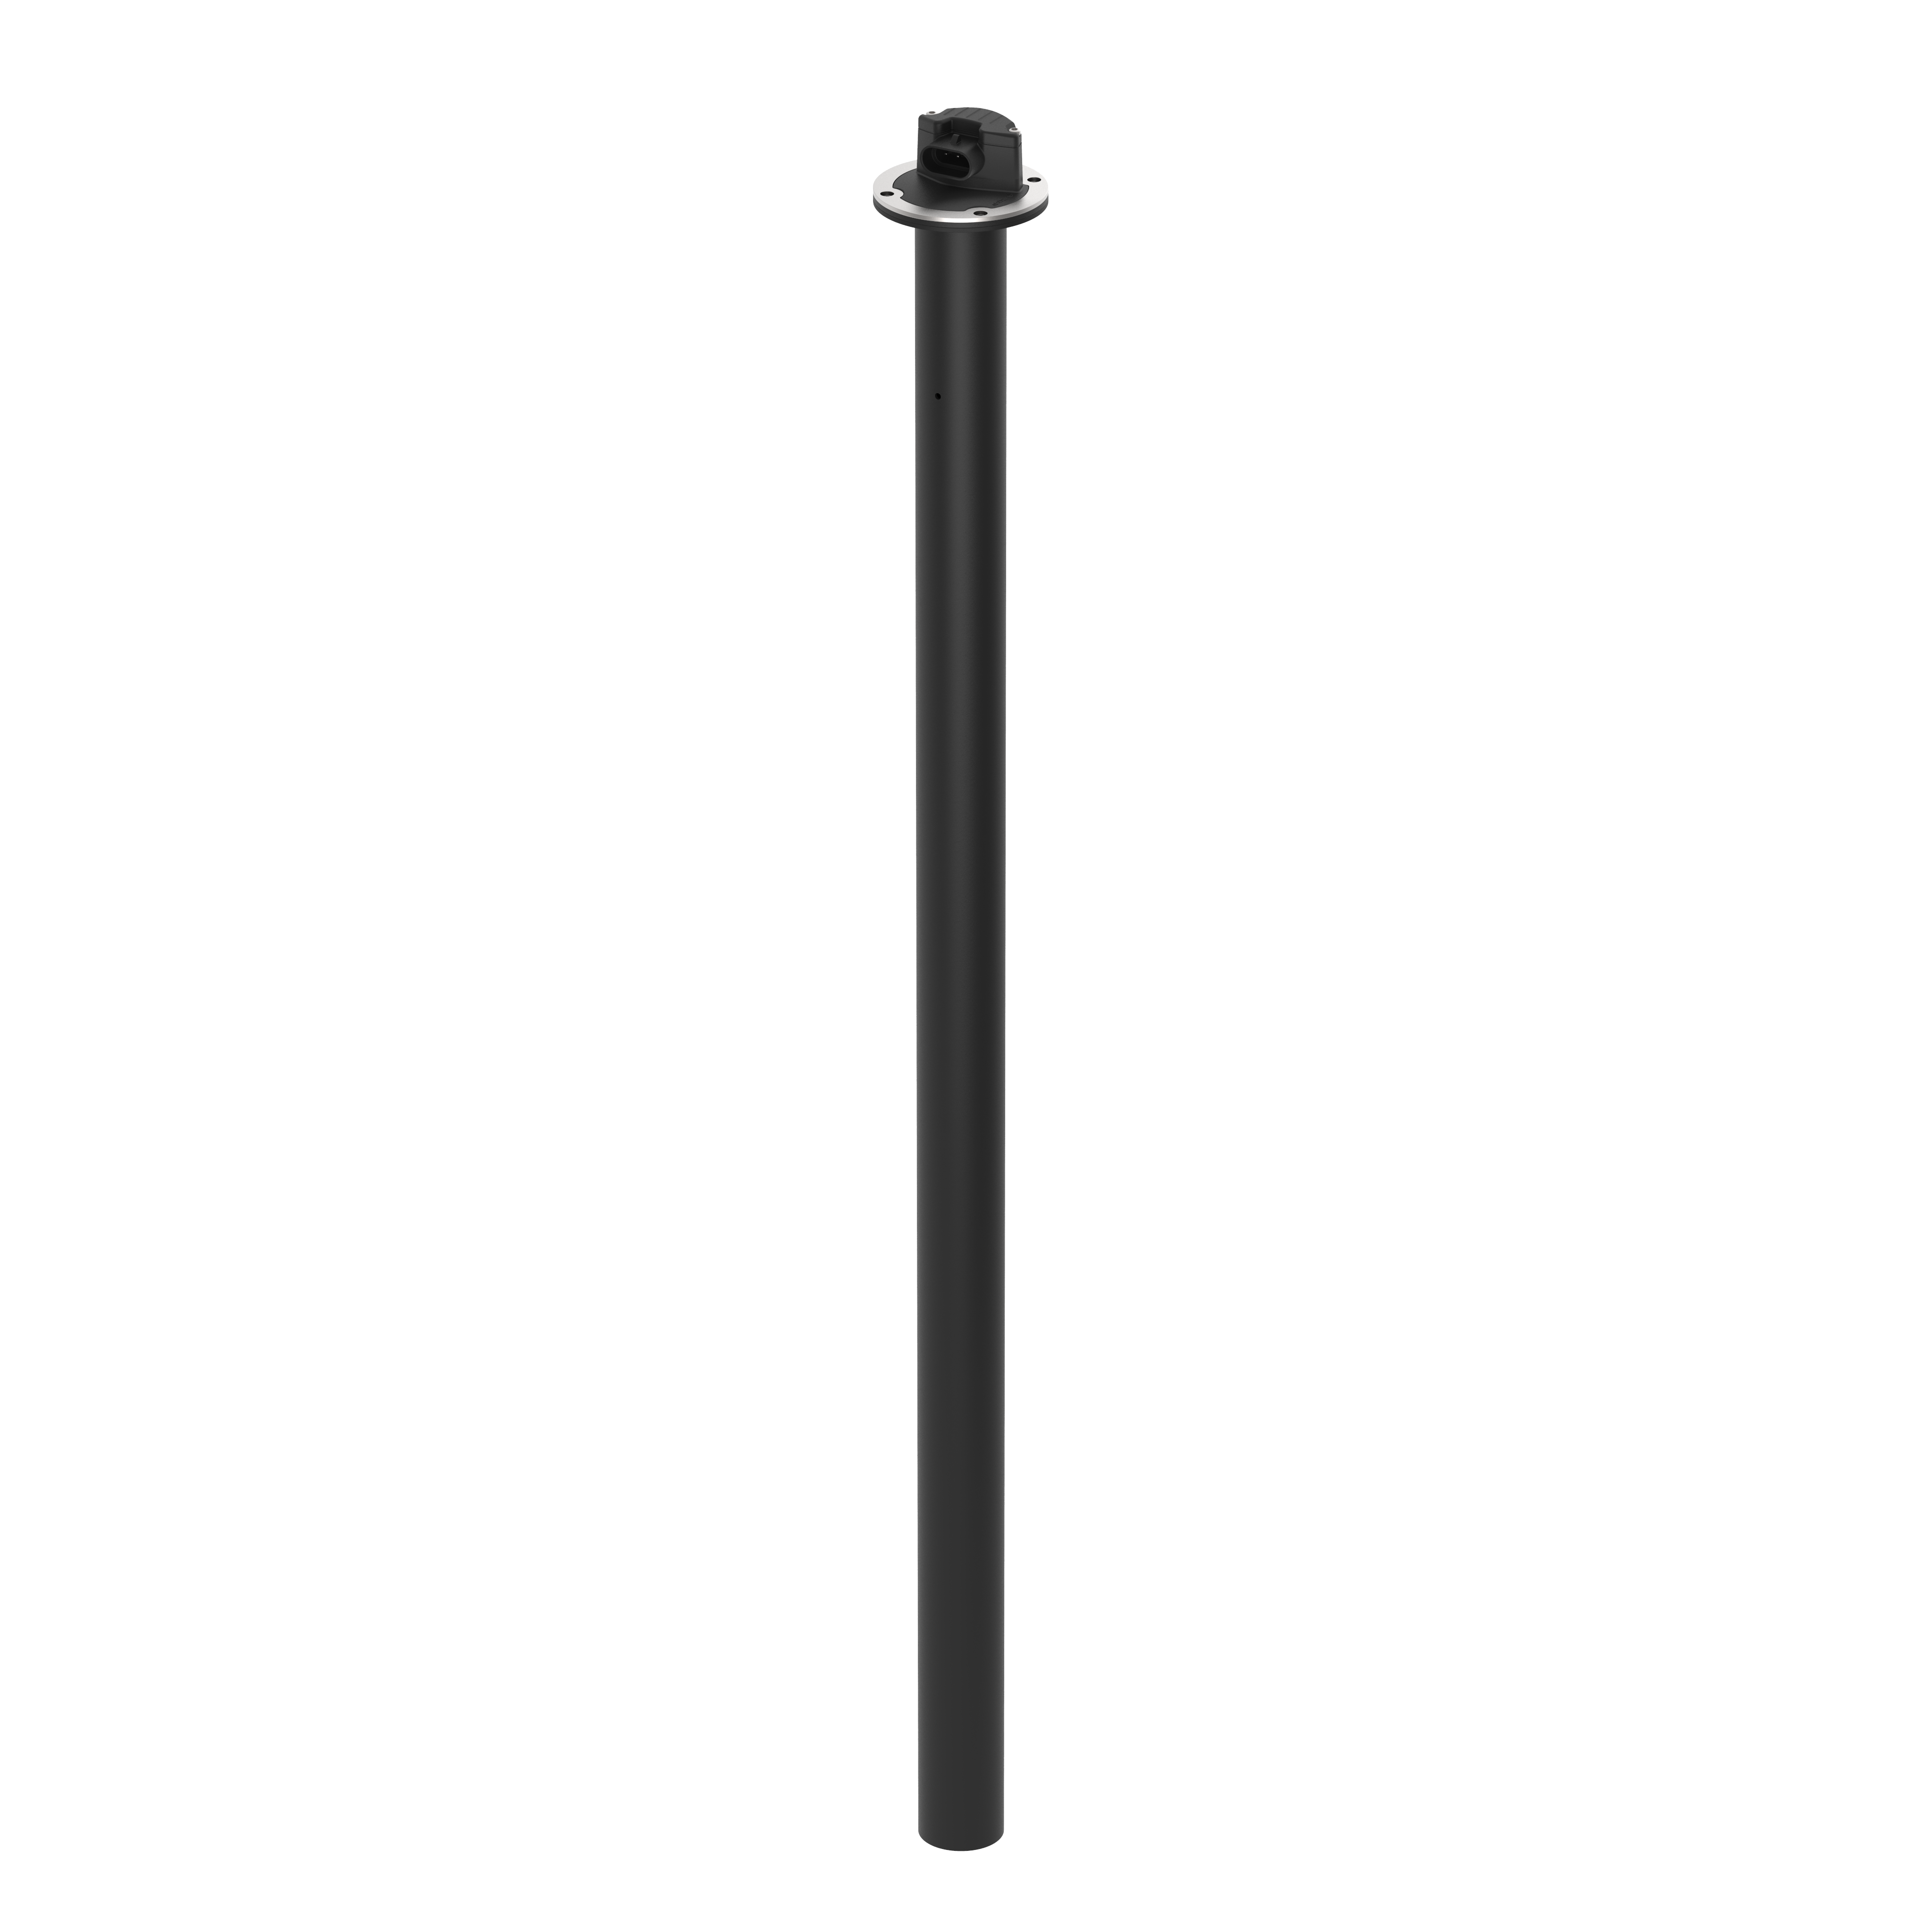 Ultraschallsensor 2UF Off-Highway - 2UF10800701AA00 - Messbereich 800mm - 0,5-4,5V